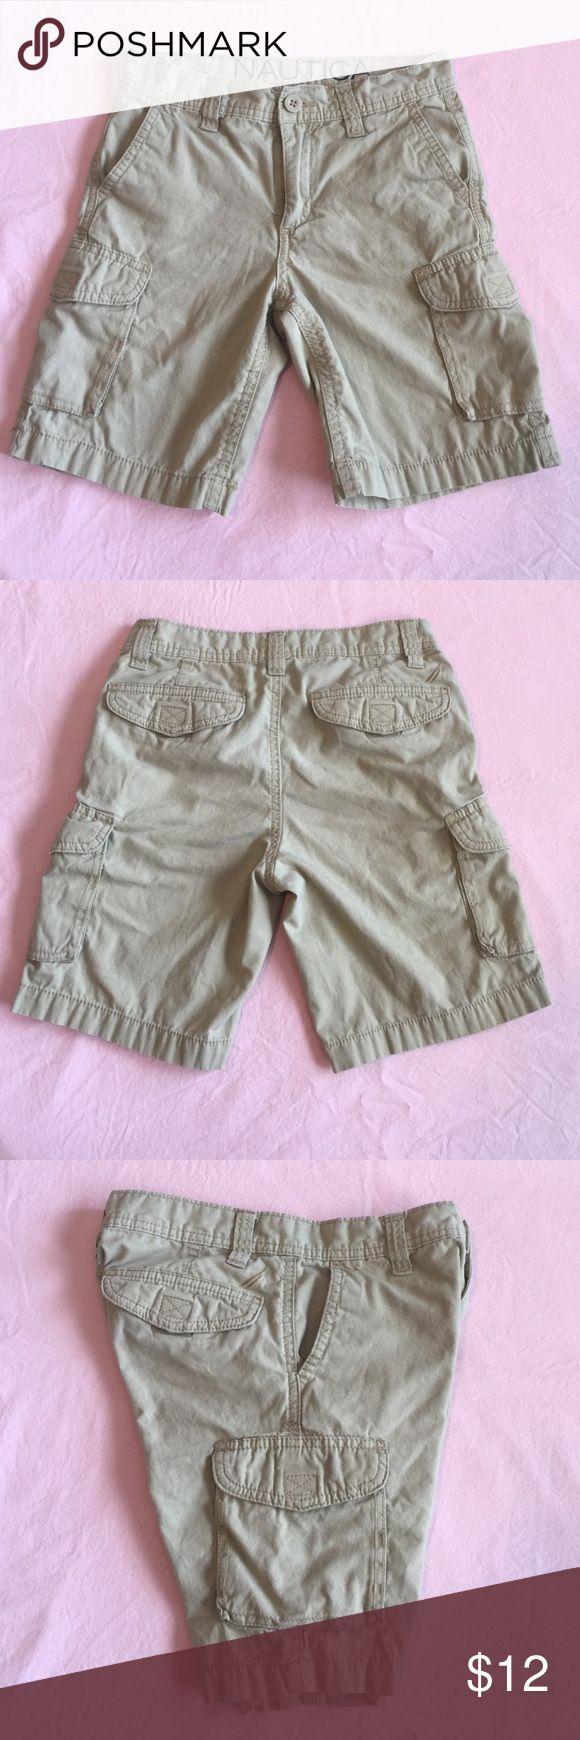 Nautica size 8 boys cargo shorts Excellent condition, khaki cargo shorts by Nautica.  Velcro on cargo pockets.  Zipper has NO damage Nautica Bottoms Shorts